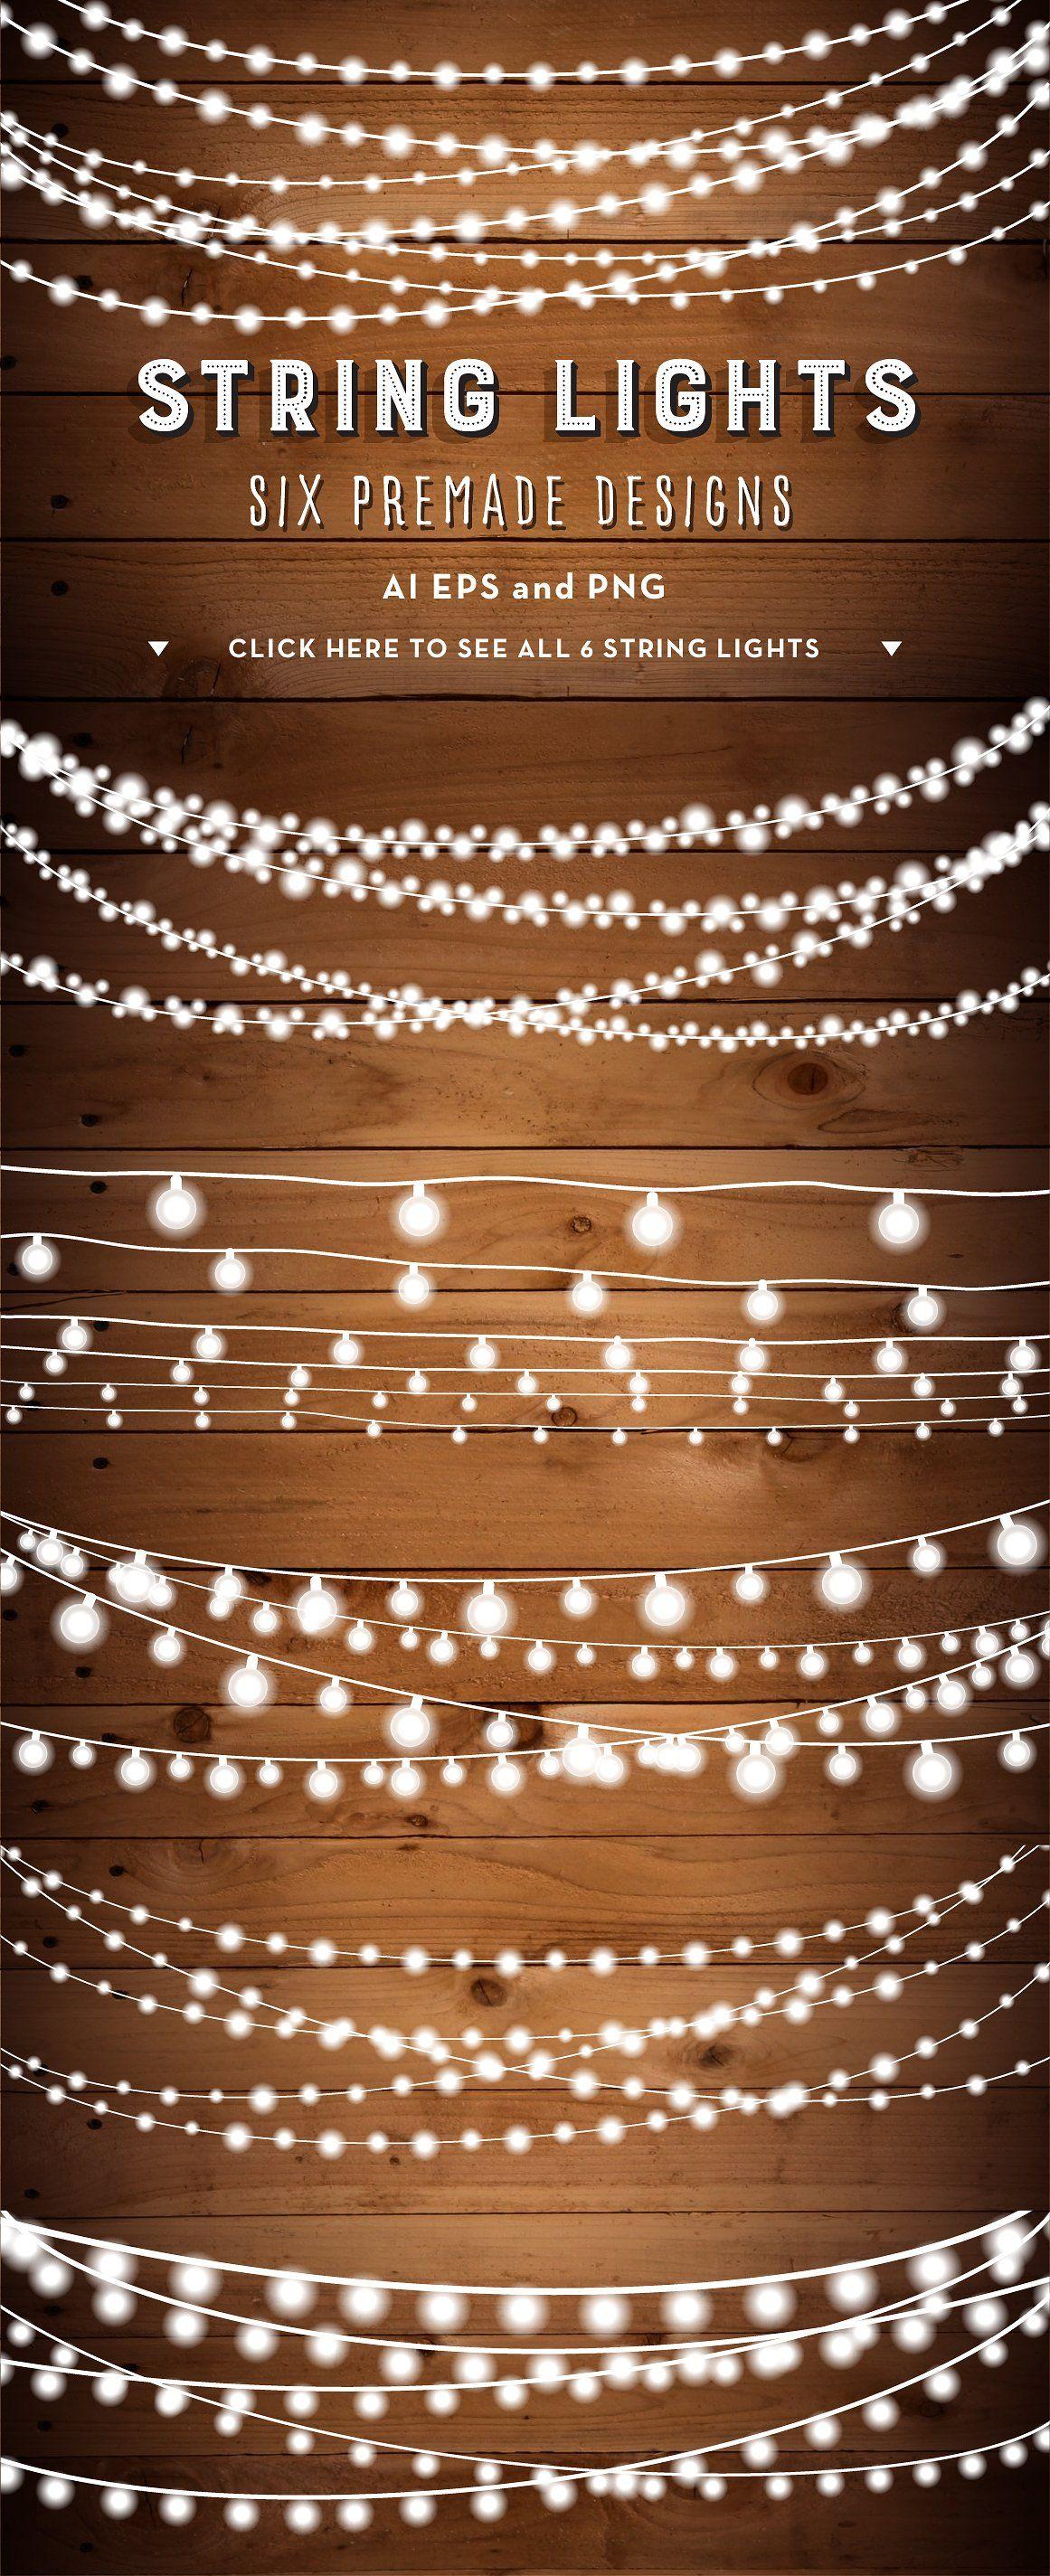 String Lights With Clips String Lights Bunches Clip Art Set  Pinterest  Clip Art Lights